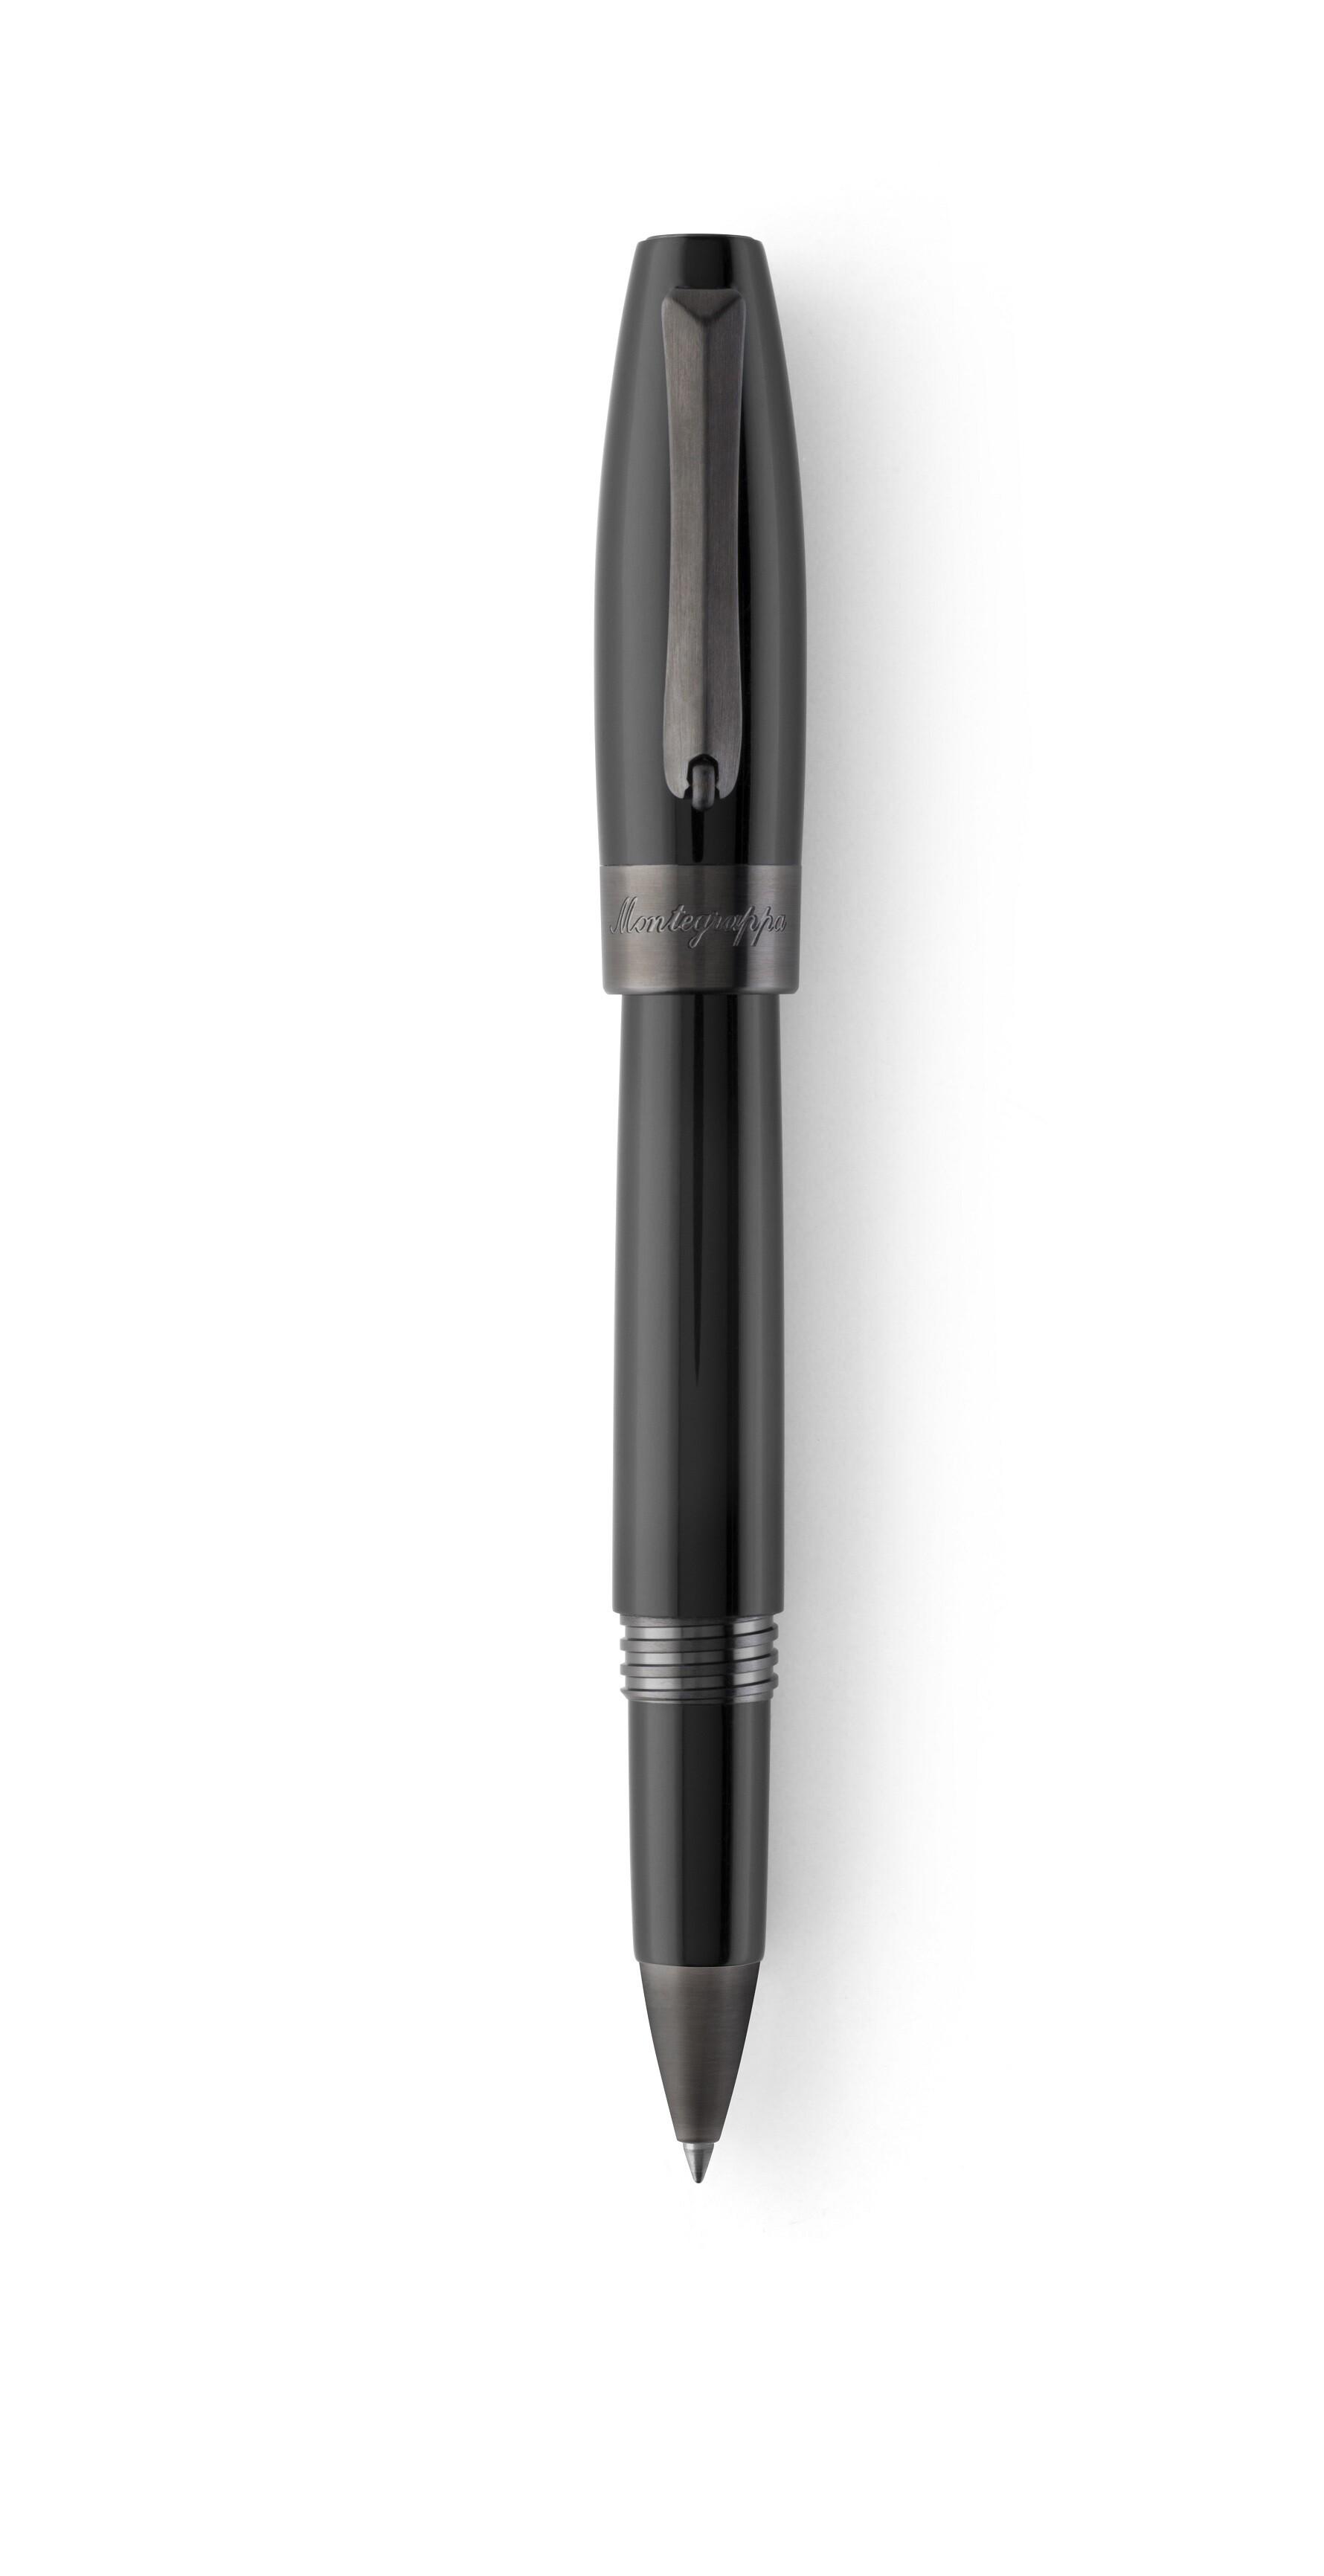 Montegrappa Fortuna Black Ruthenium Tintenroller 01